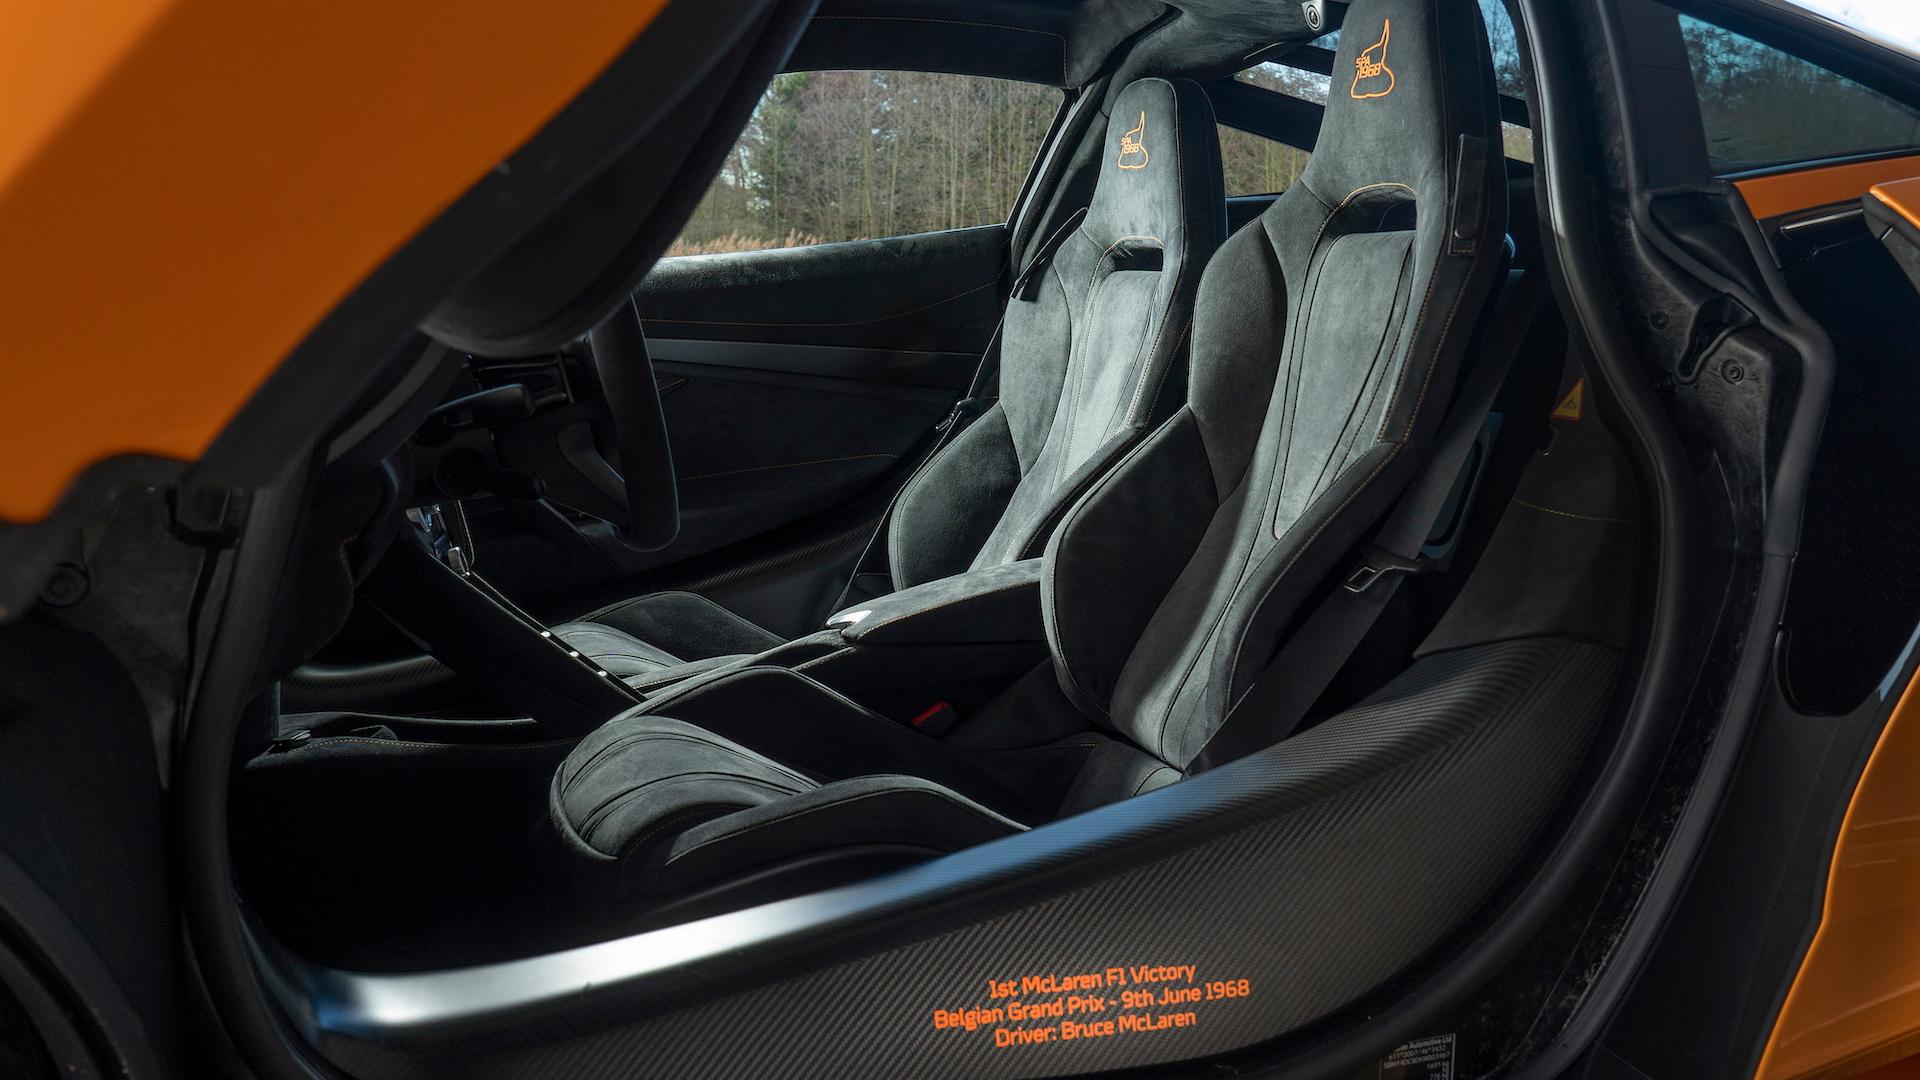 McLaren 720S Spa 68 special edition